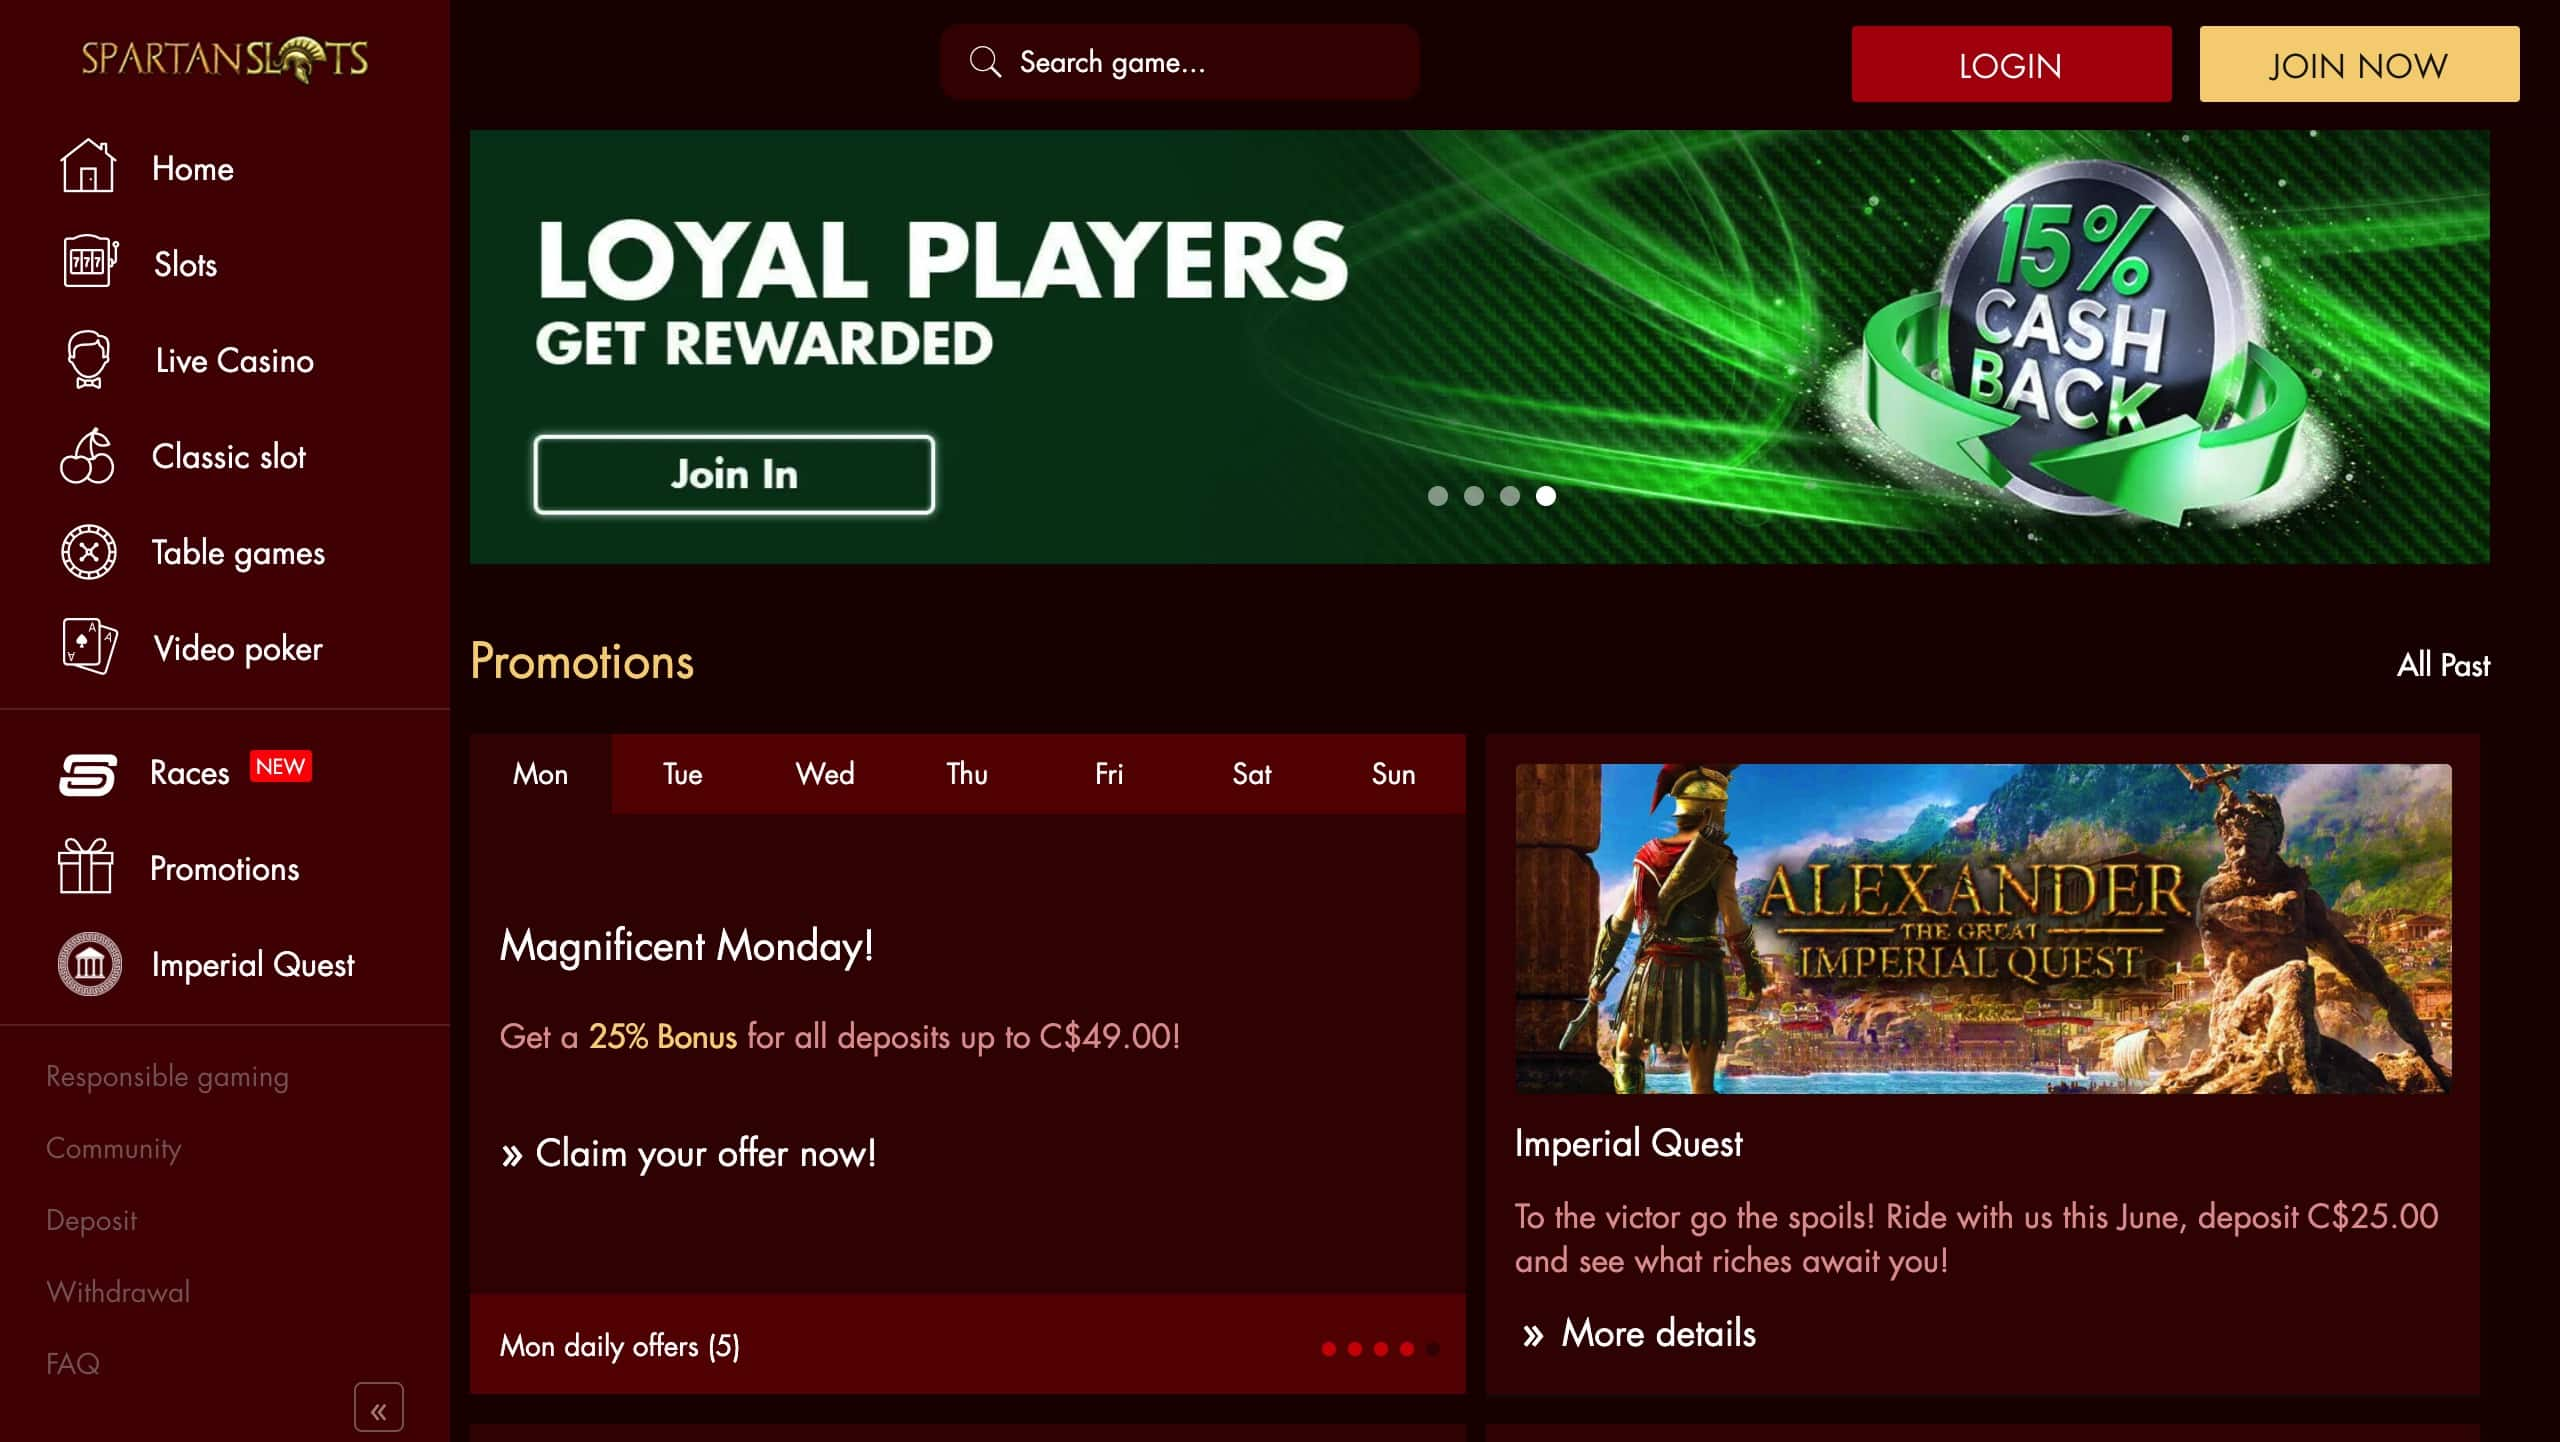 Spartan Slots Loyalty Program